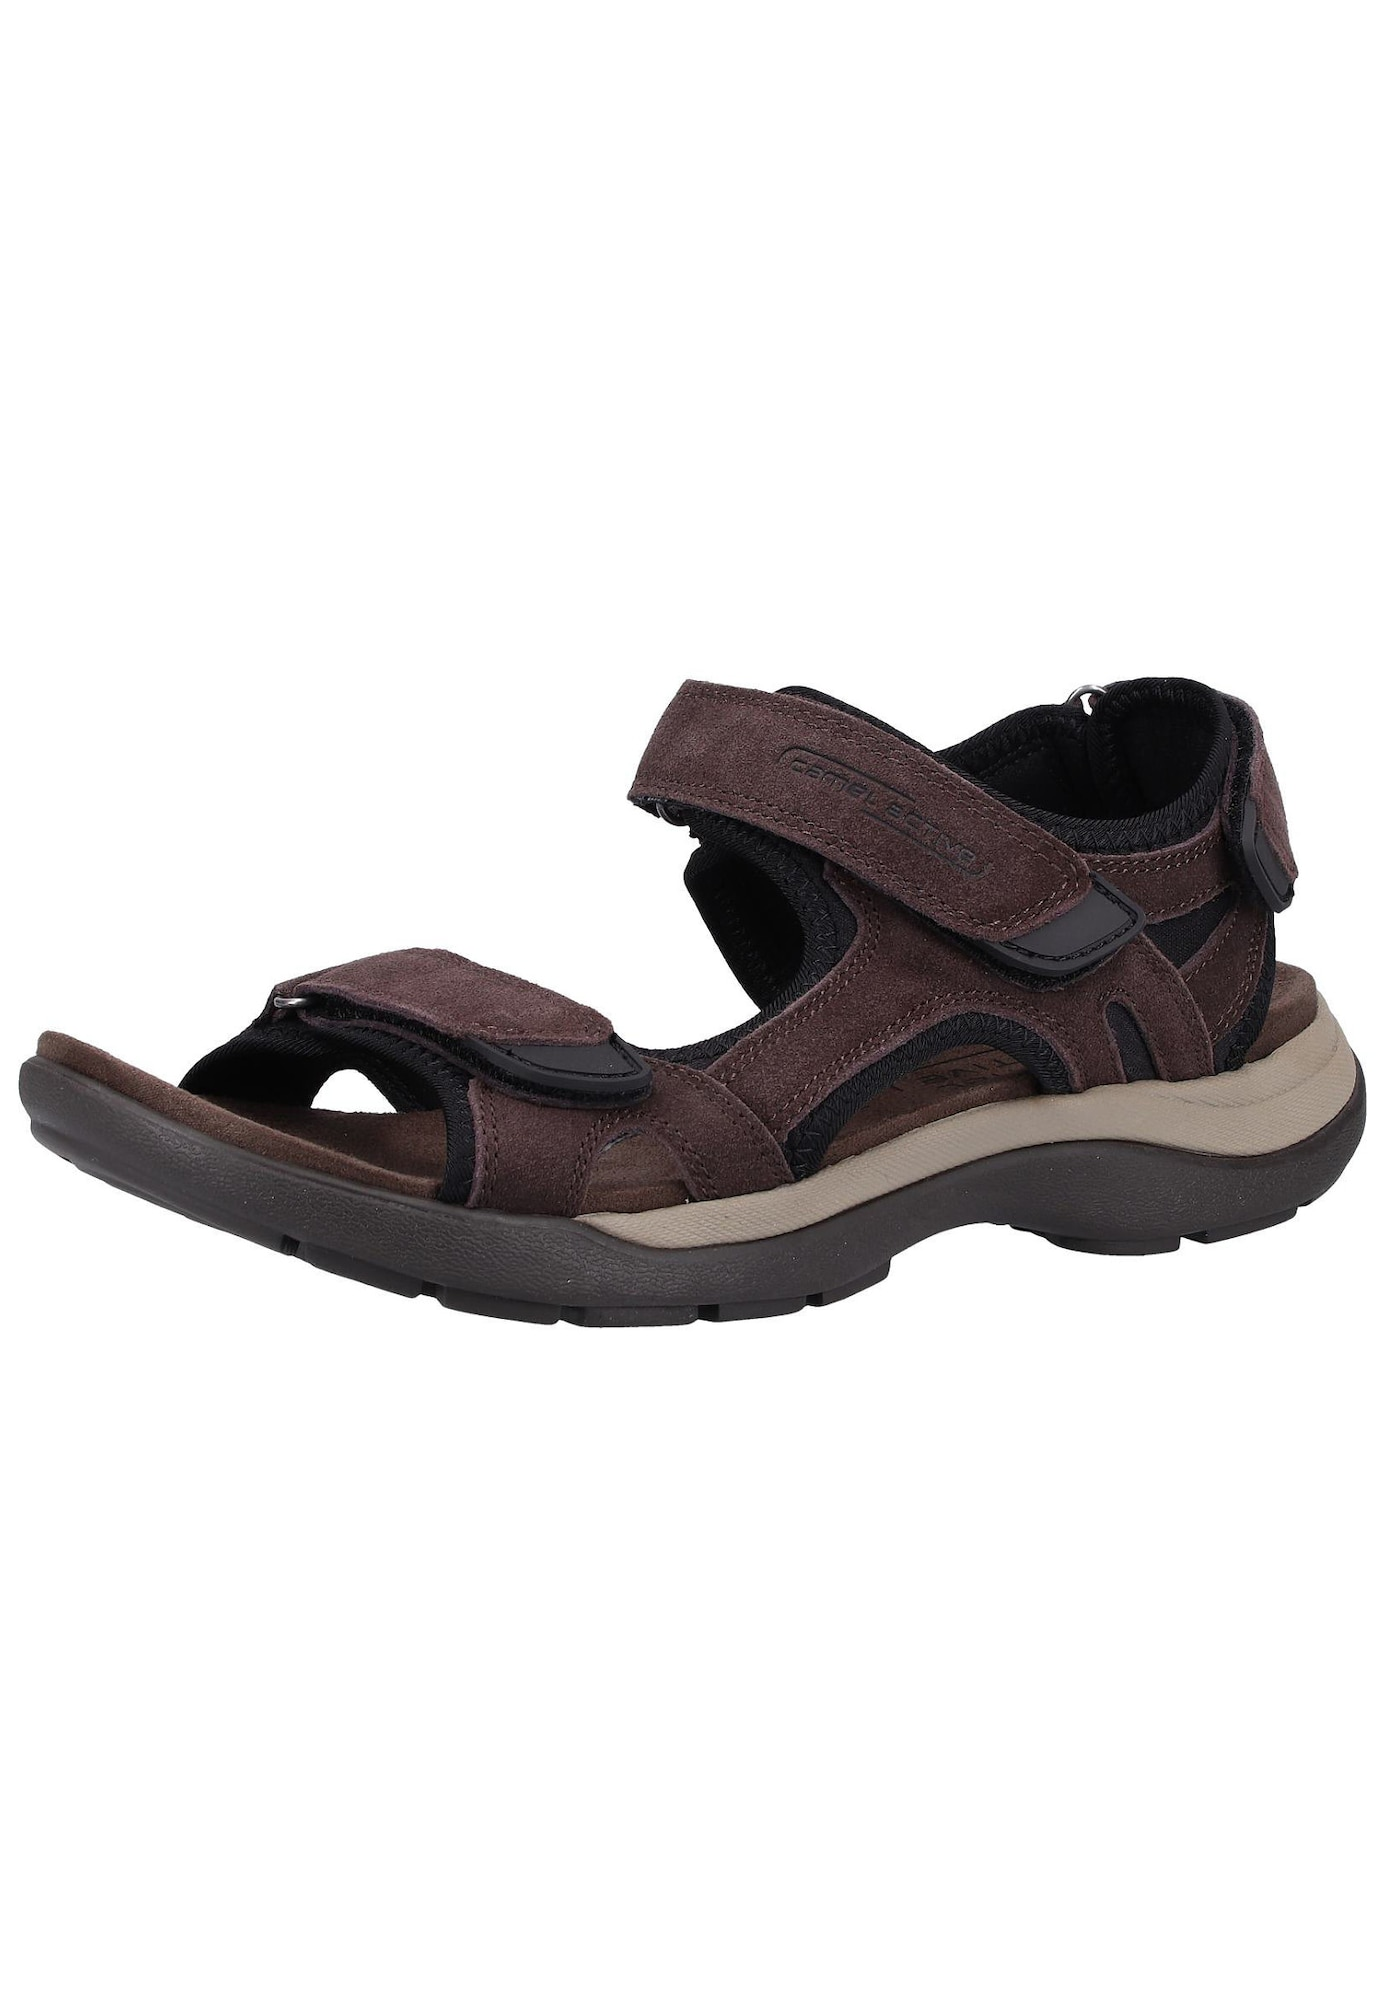 Sandalen | Schuhe > Sandalen & Zehentrenner | camel active